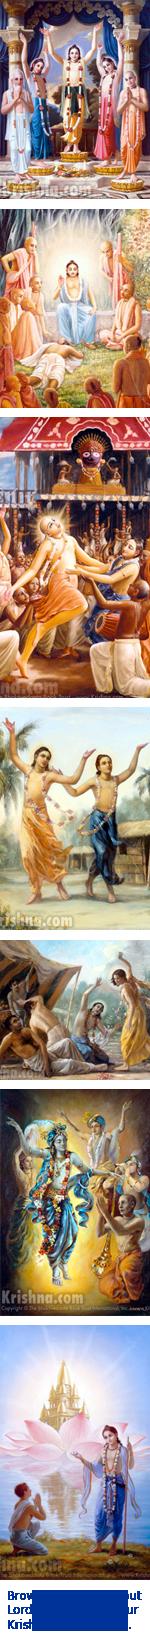 Lord Nityananda Balarama